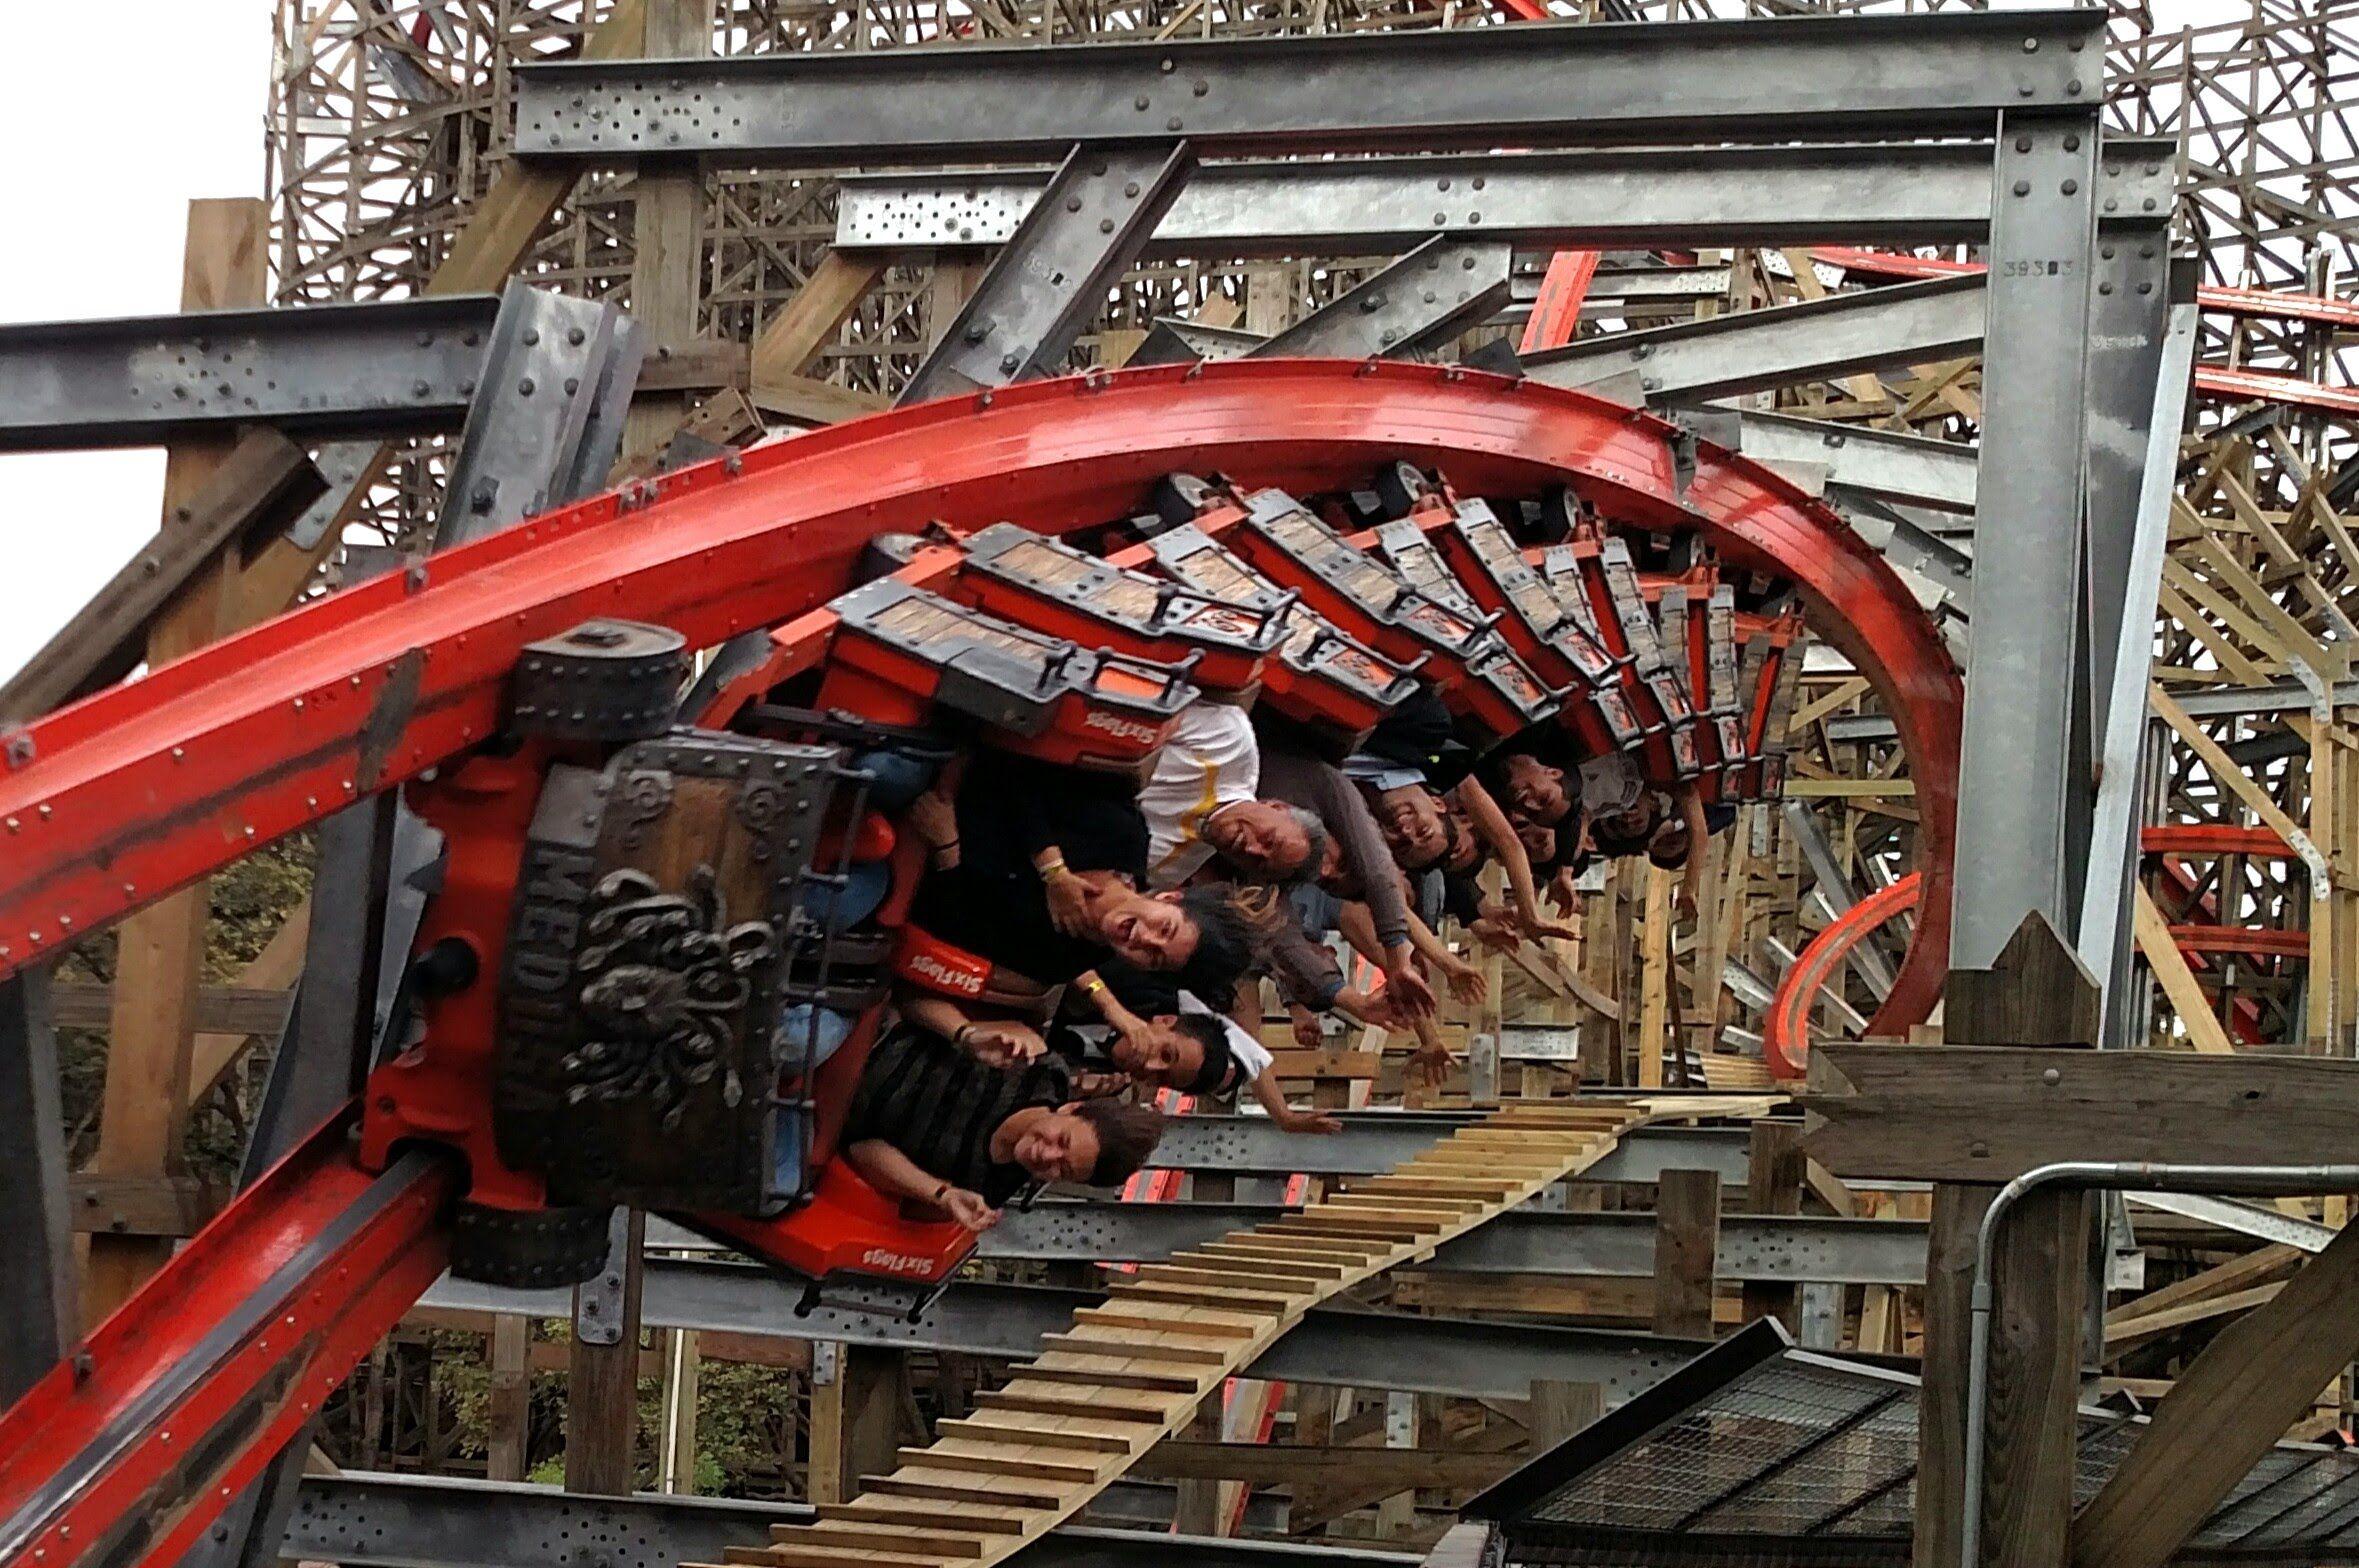 Medusa Steel Coaster Off Ride Hd Six Flags Mexico Six Flags Mexico Six Flags Roller Coaster